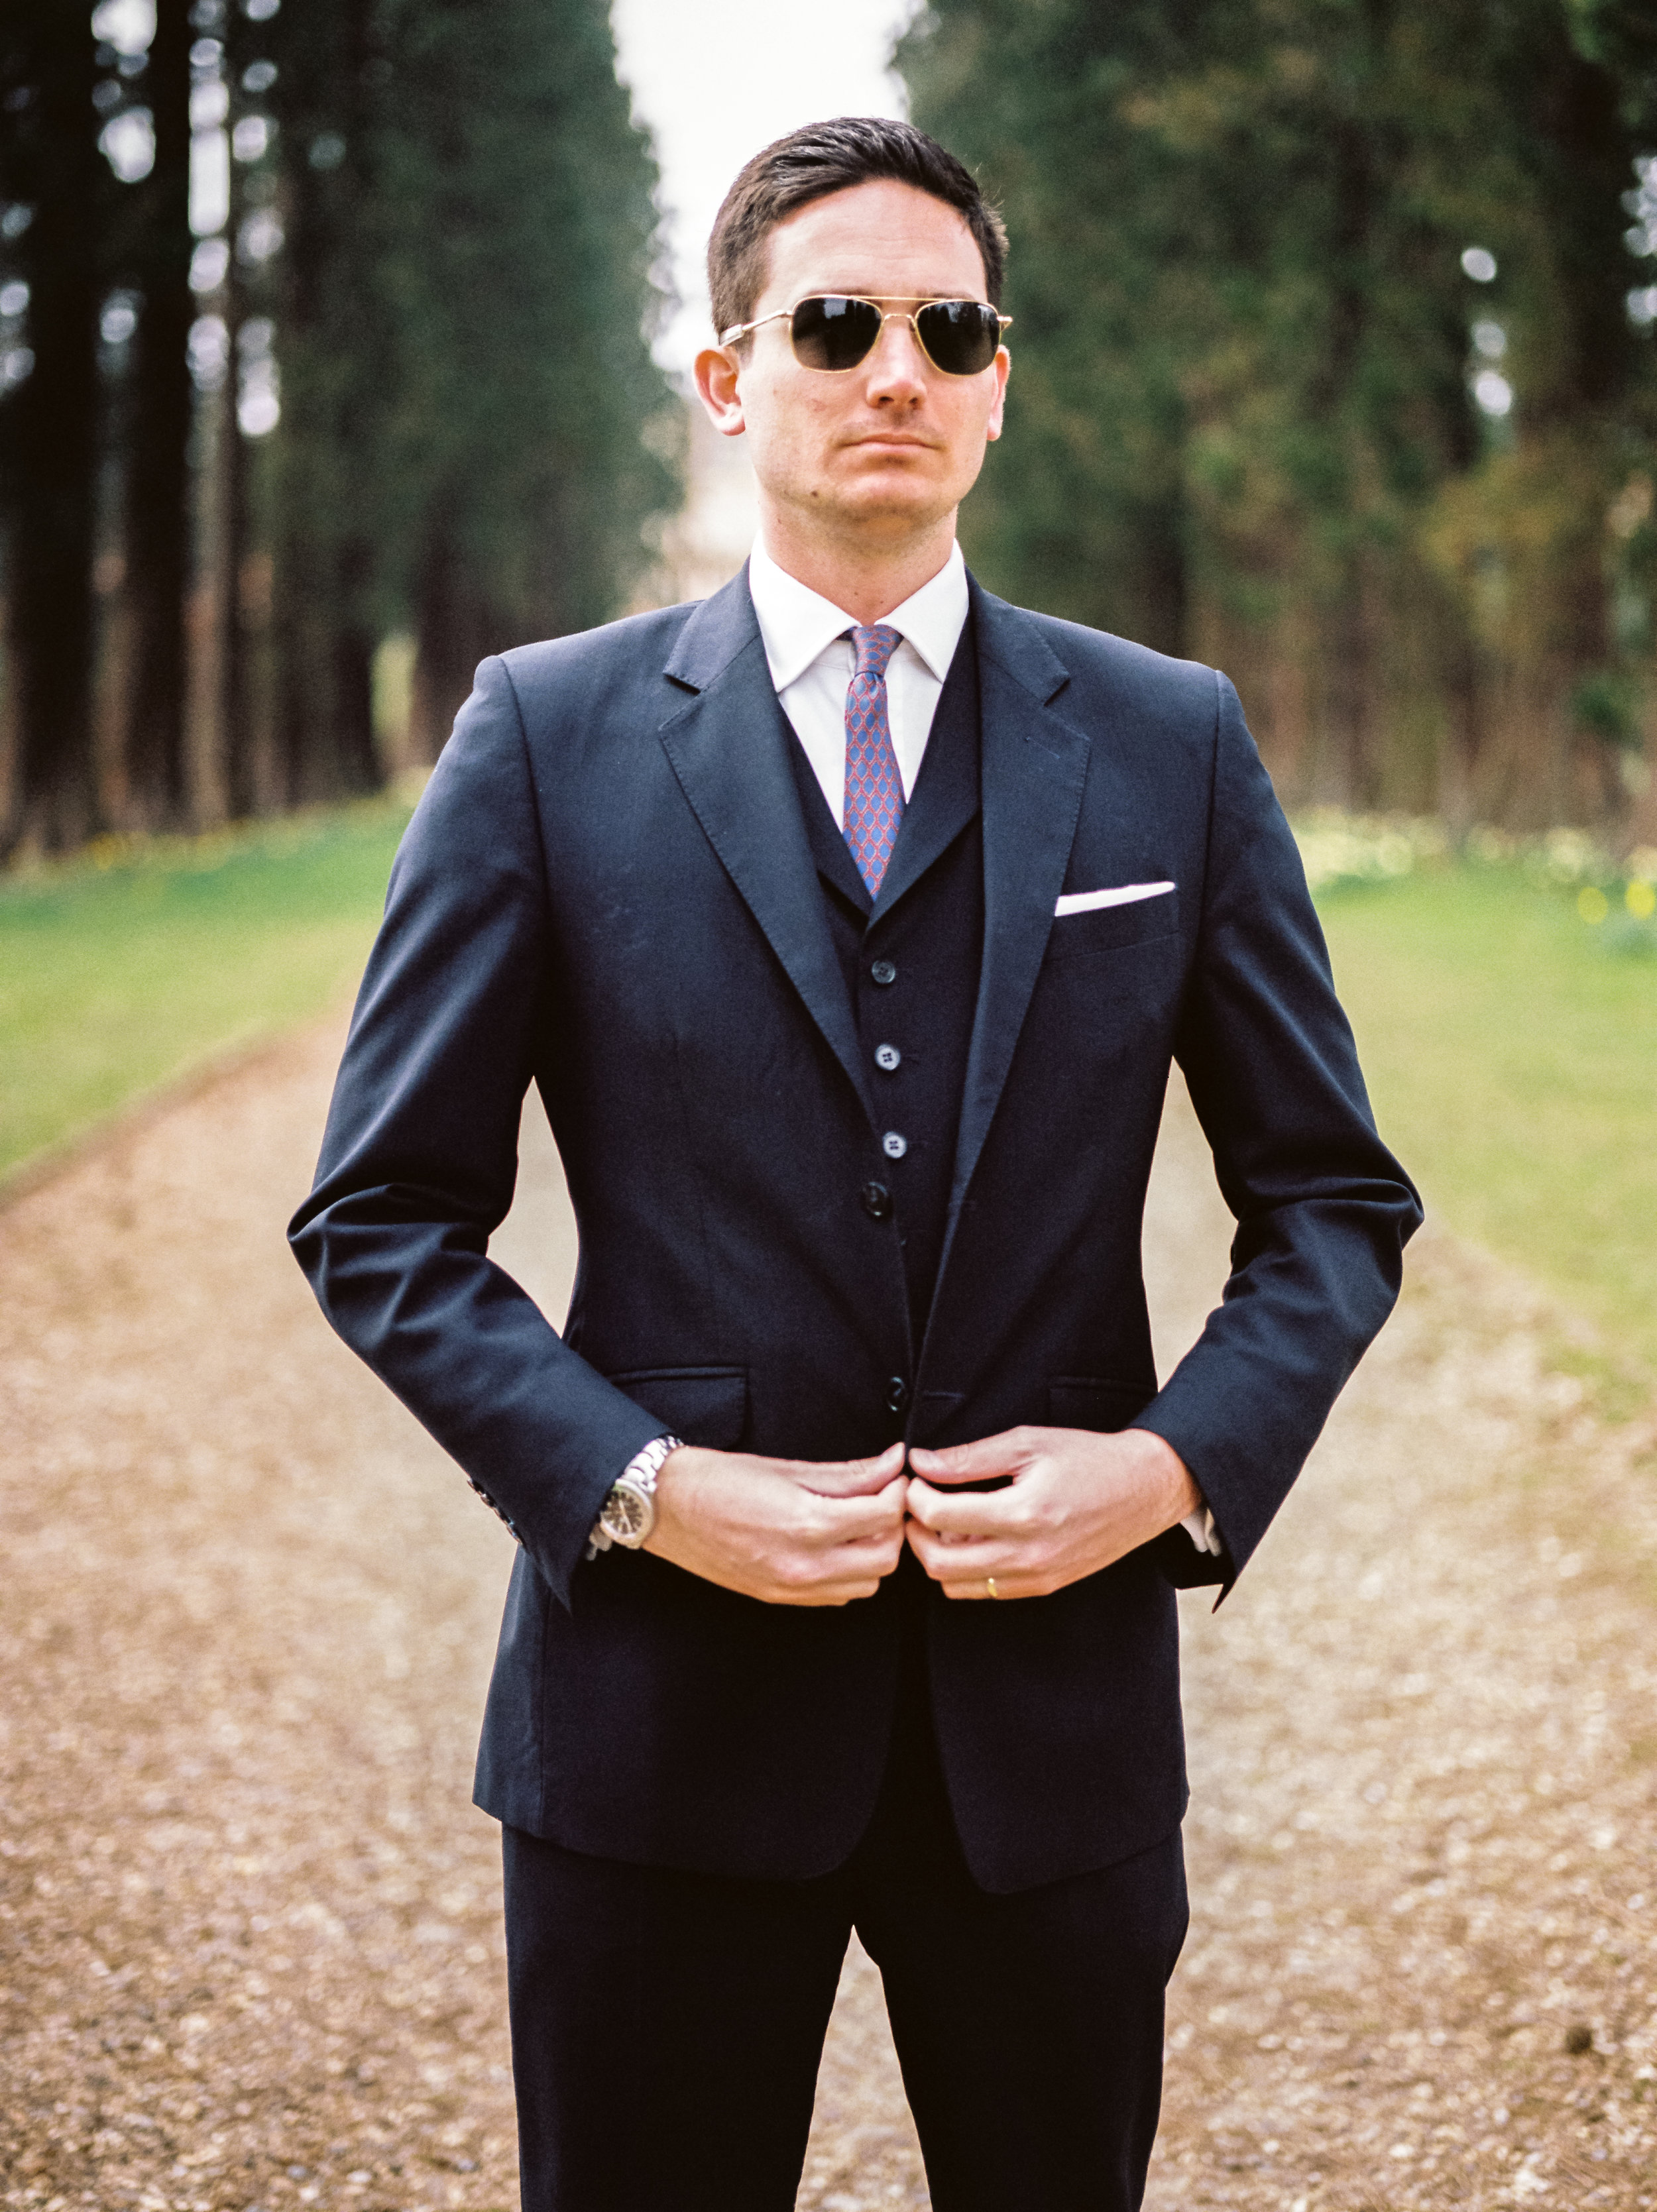 Button Up - Modern Male Fashion Portrait